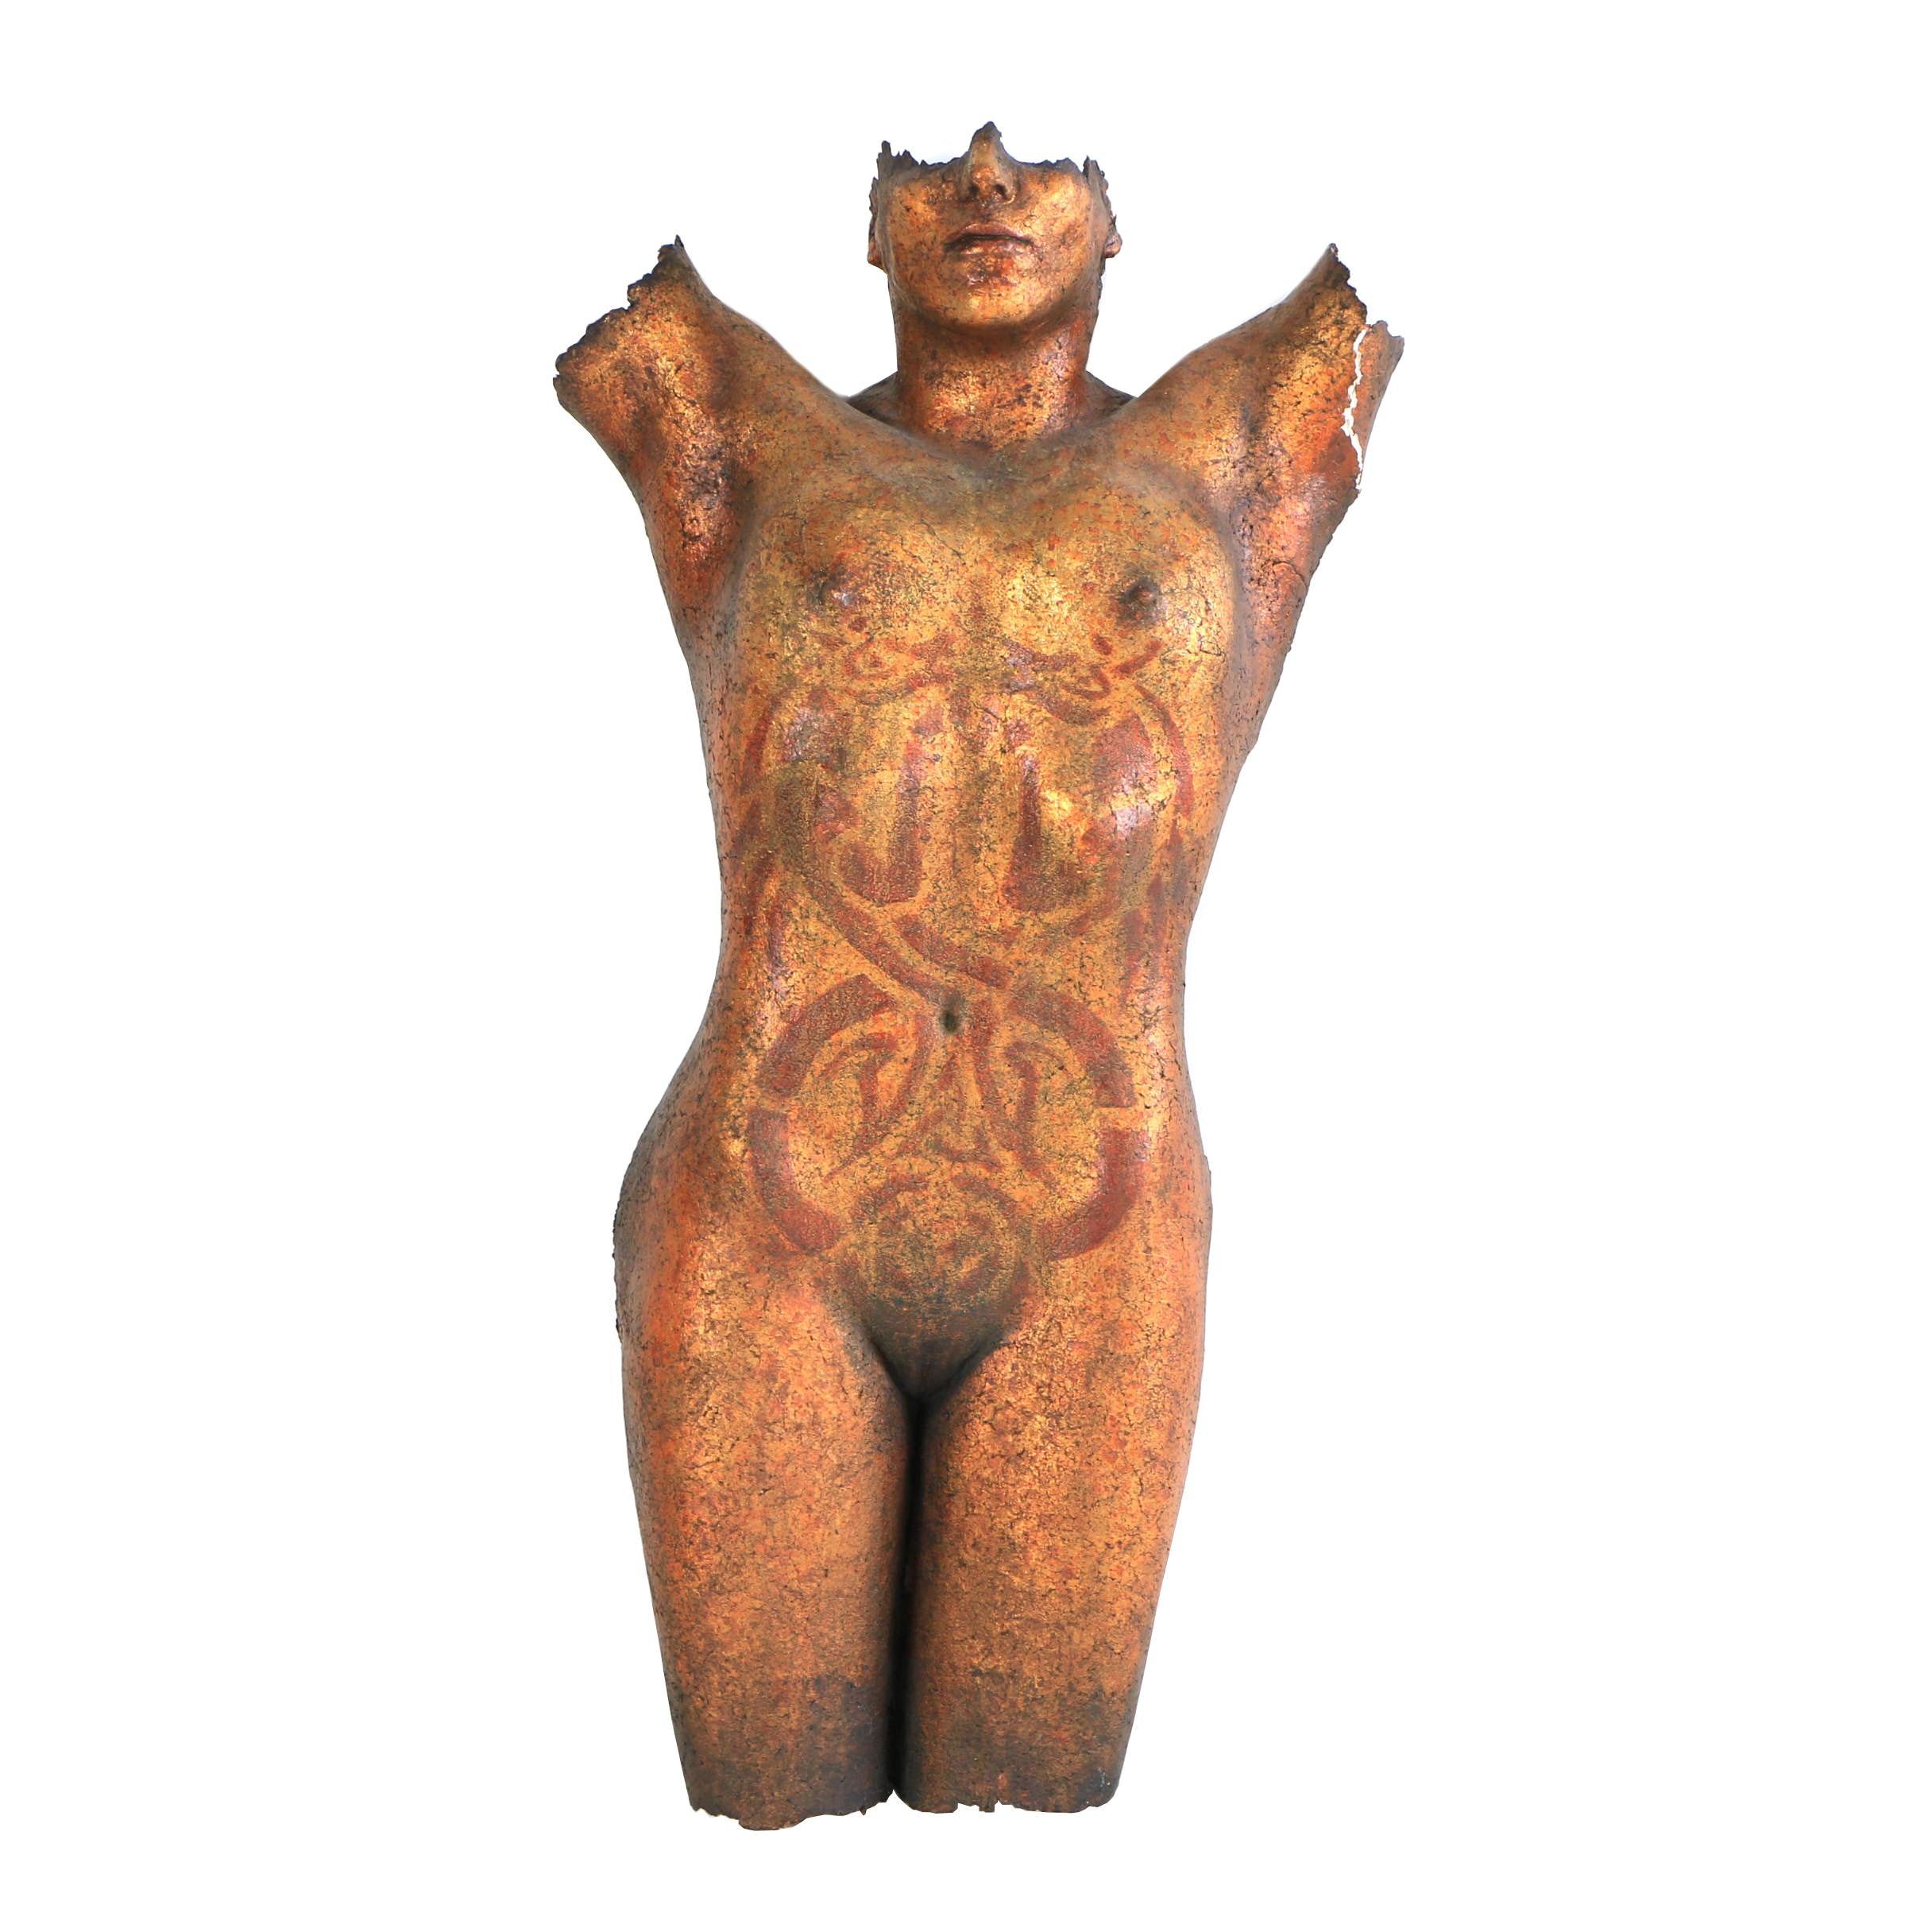 "1991 Miles Lowry ""Female Torso"" Cast Fiberglass Wall Sculpture"